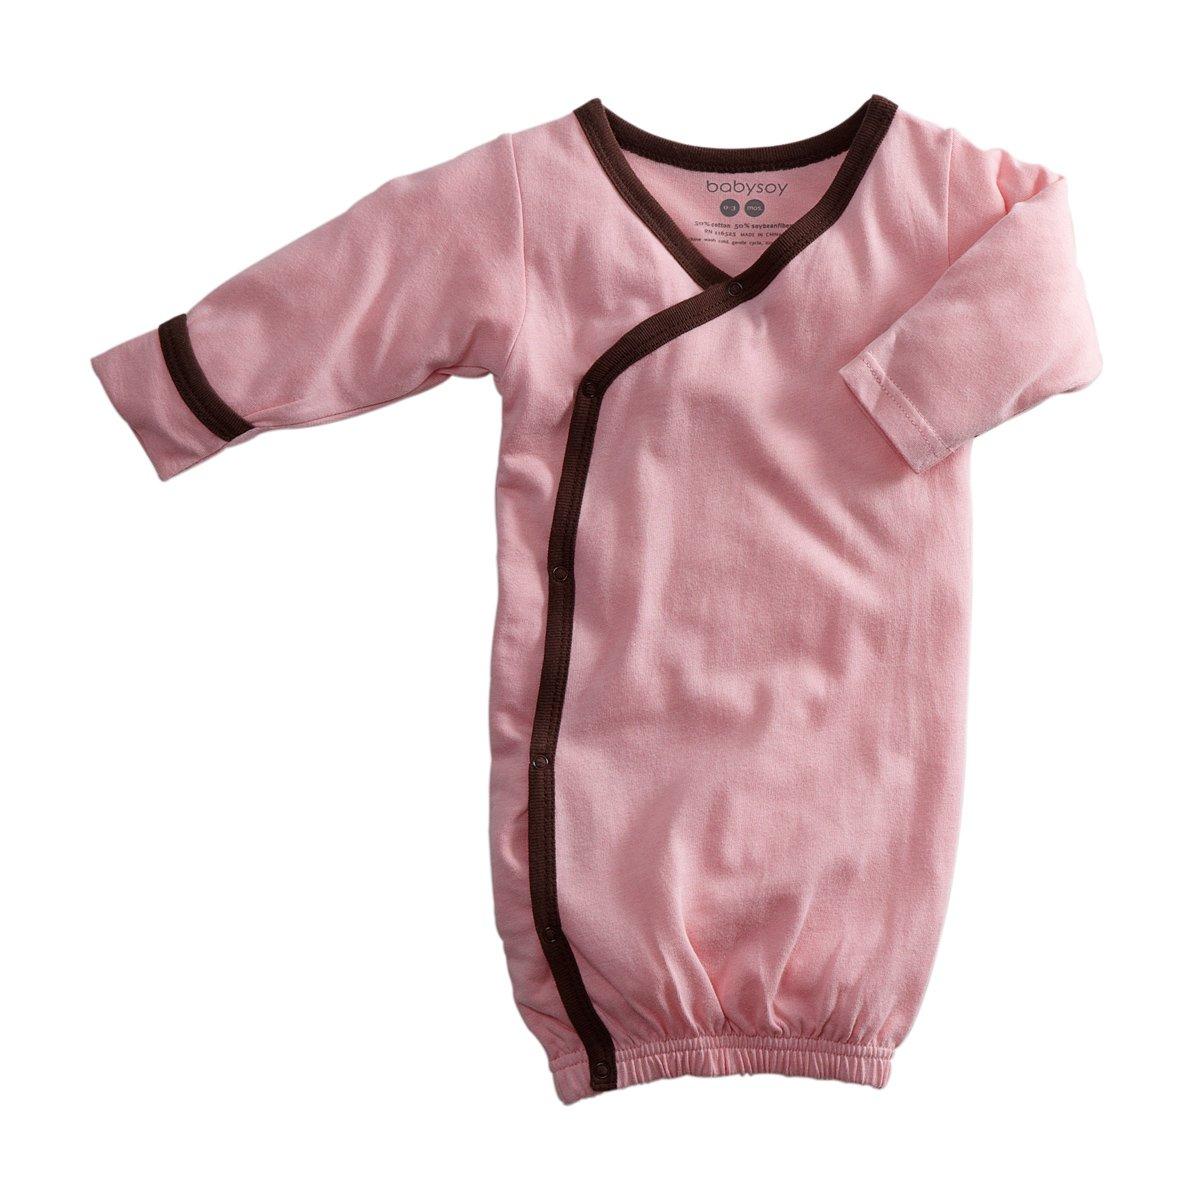 Babysoy Baby Kimono Bundler Gown Baby Soy